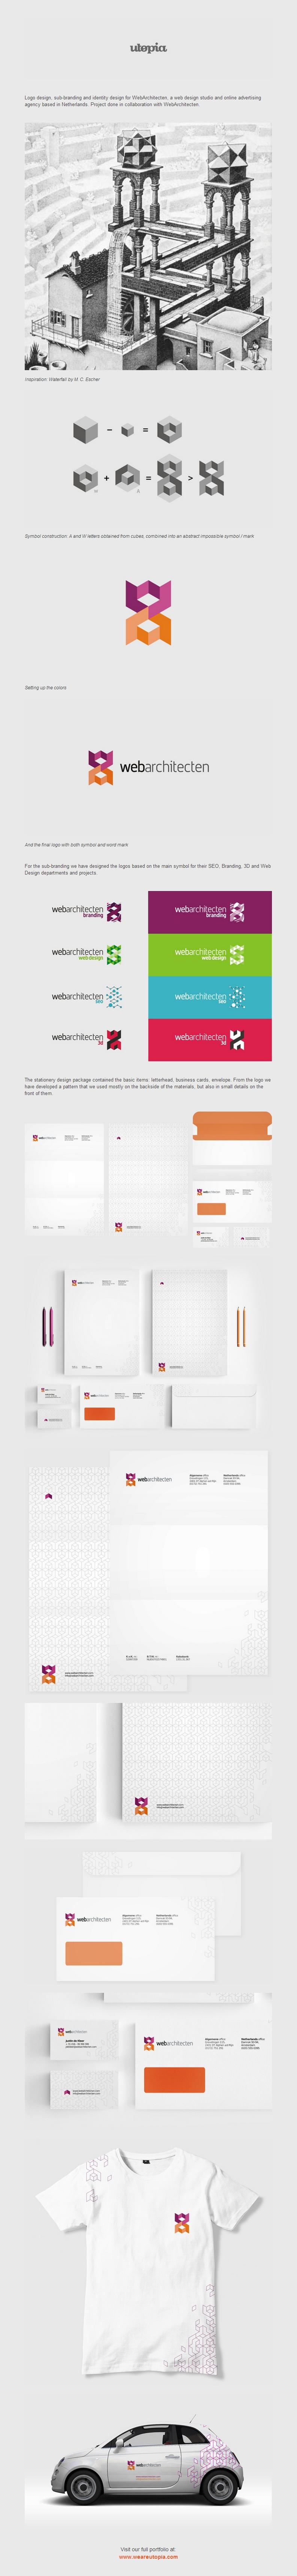 Web Architecten logo and corporate identity design by Utopia Branding Agency 2